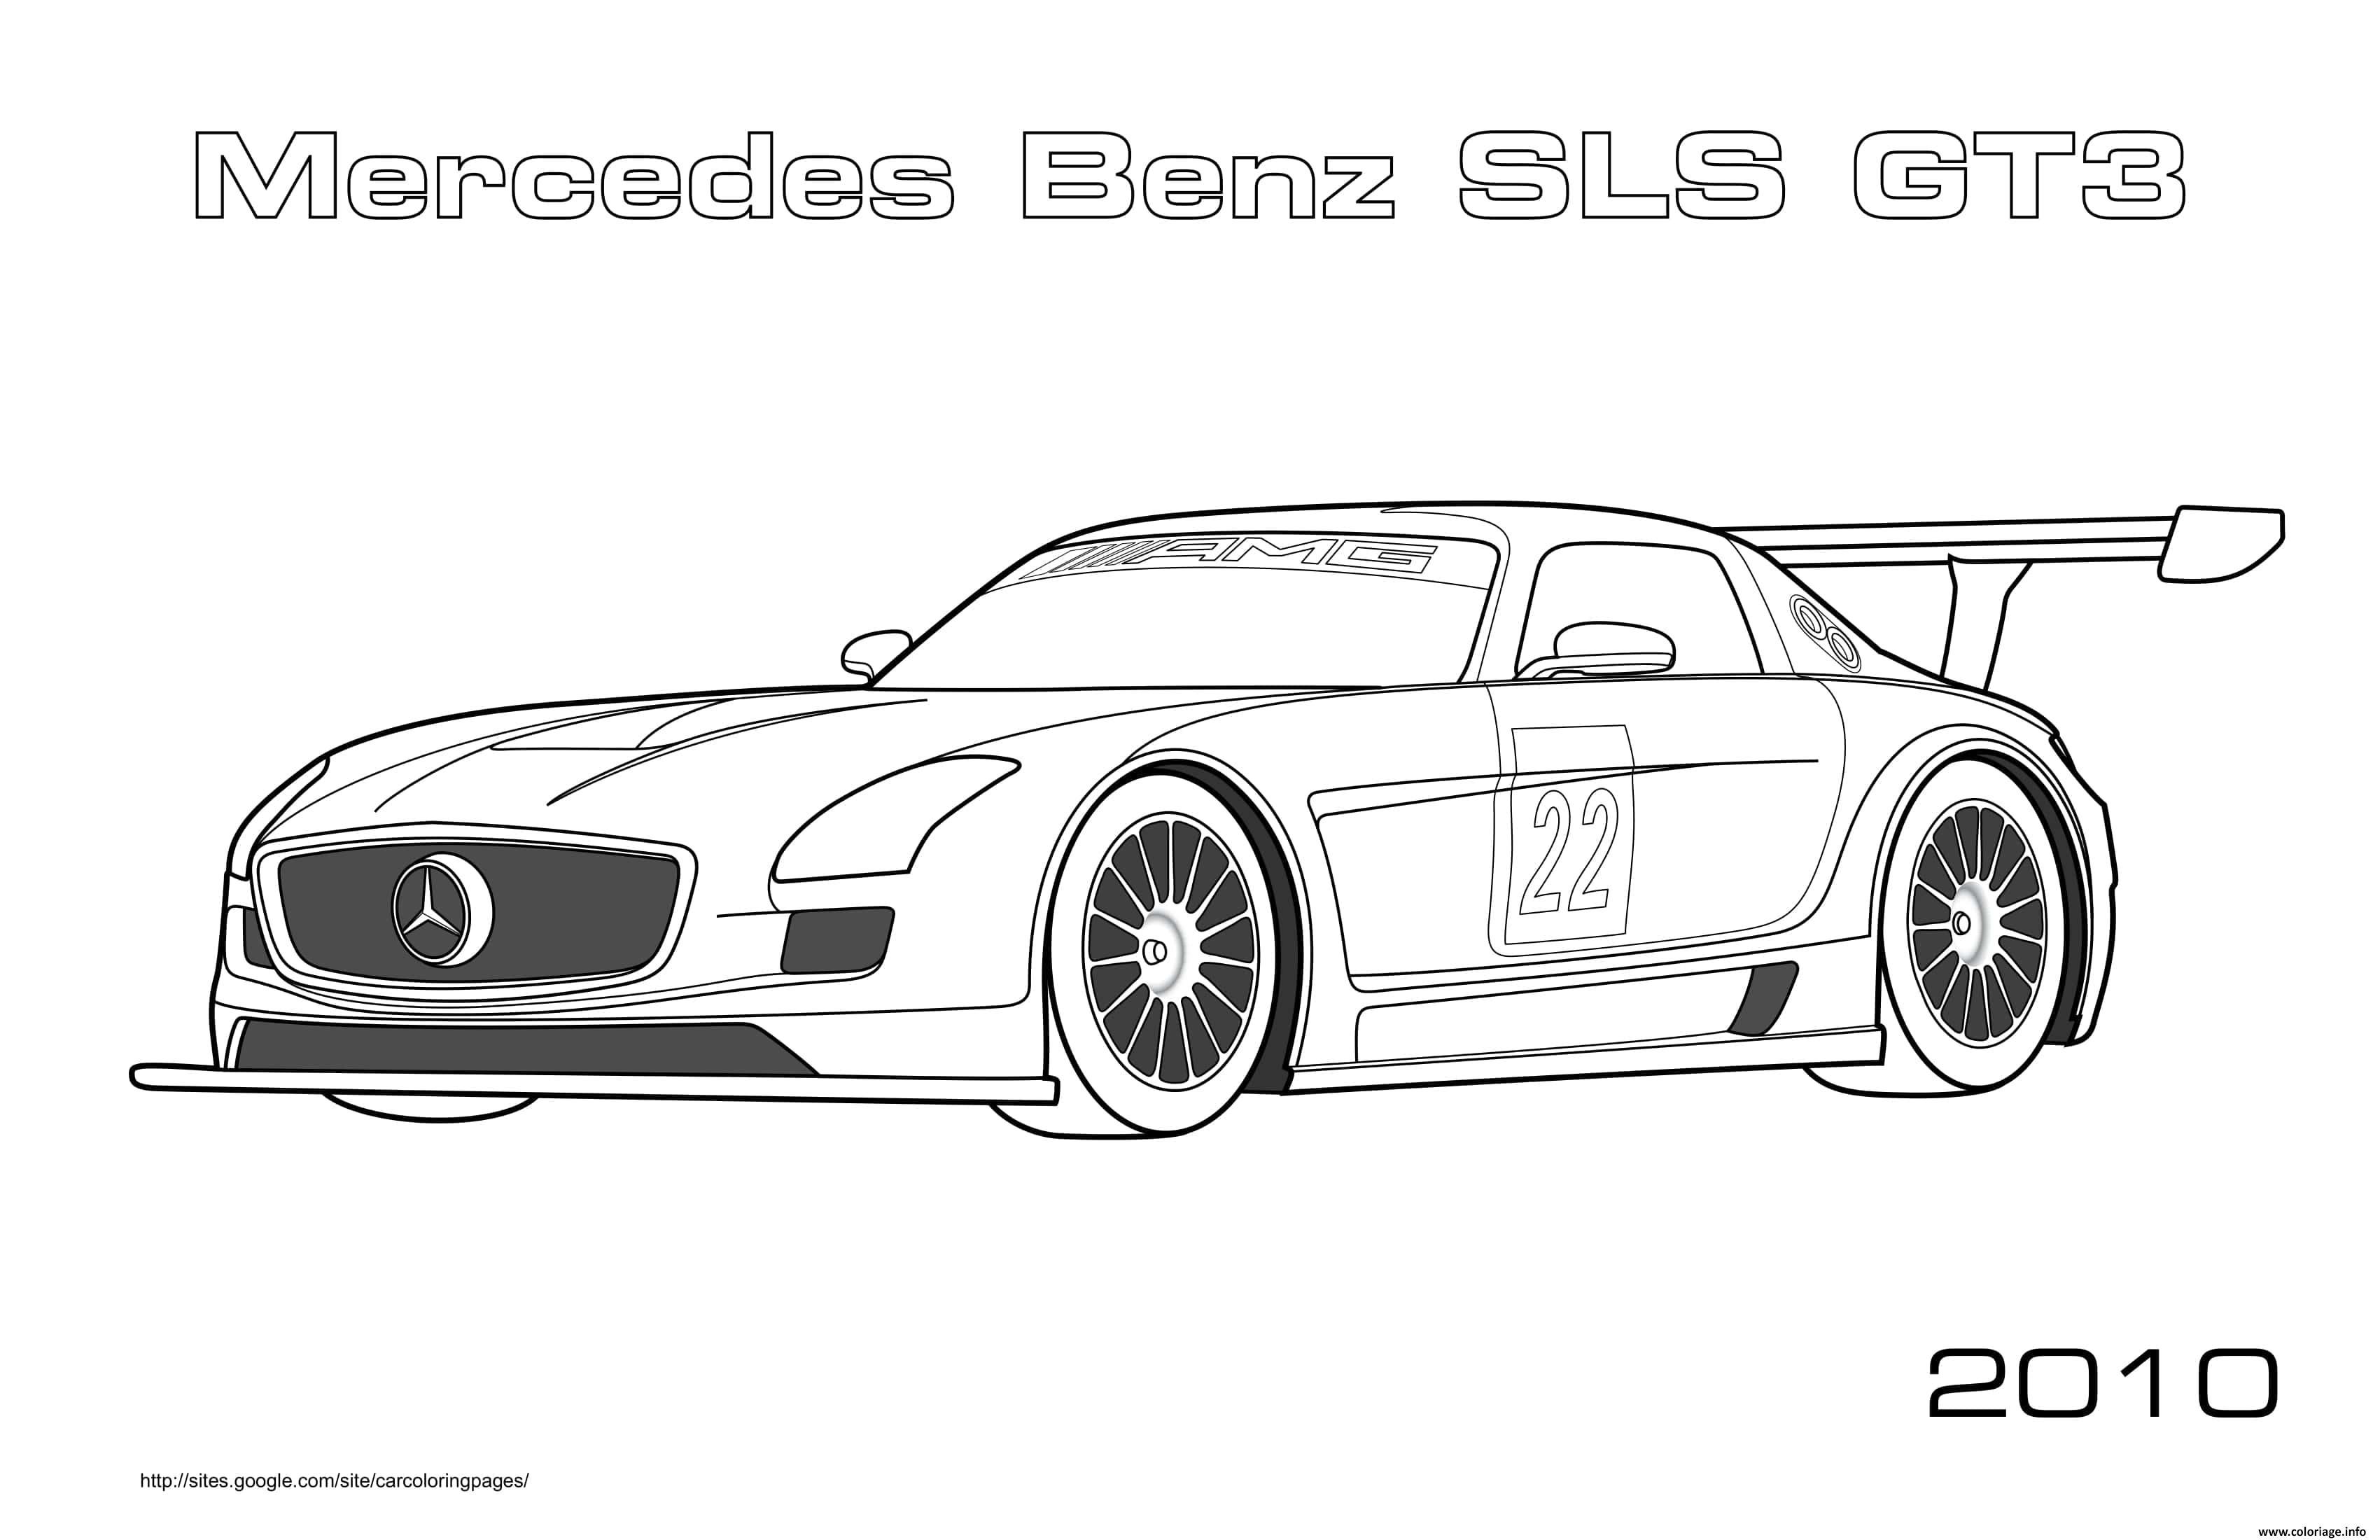 Dessin Mercedes Benz Sls Gt3 2010 Coloriage Gratuit à Imprimer